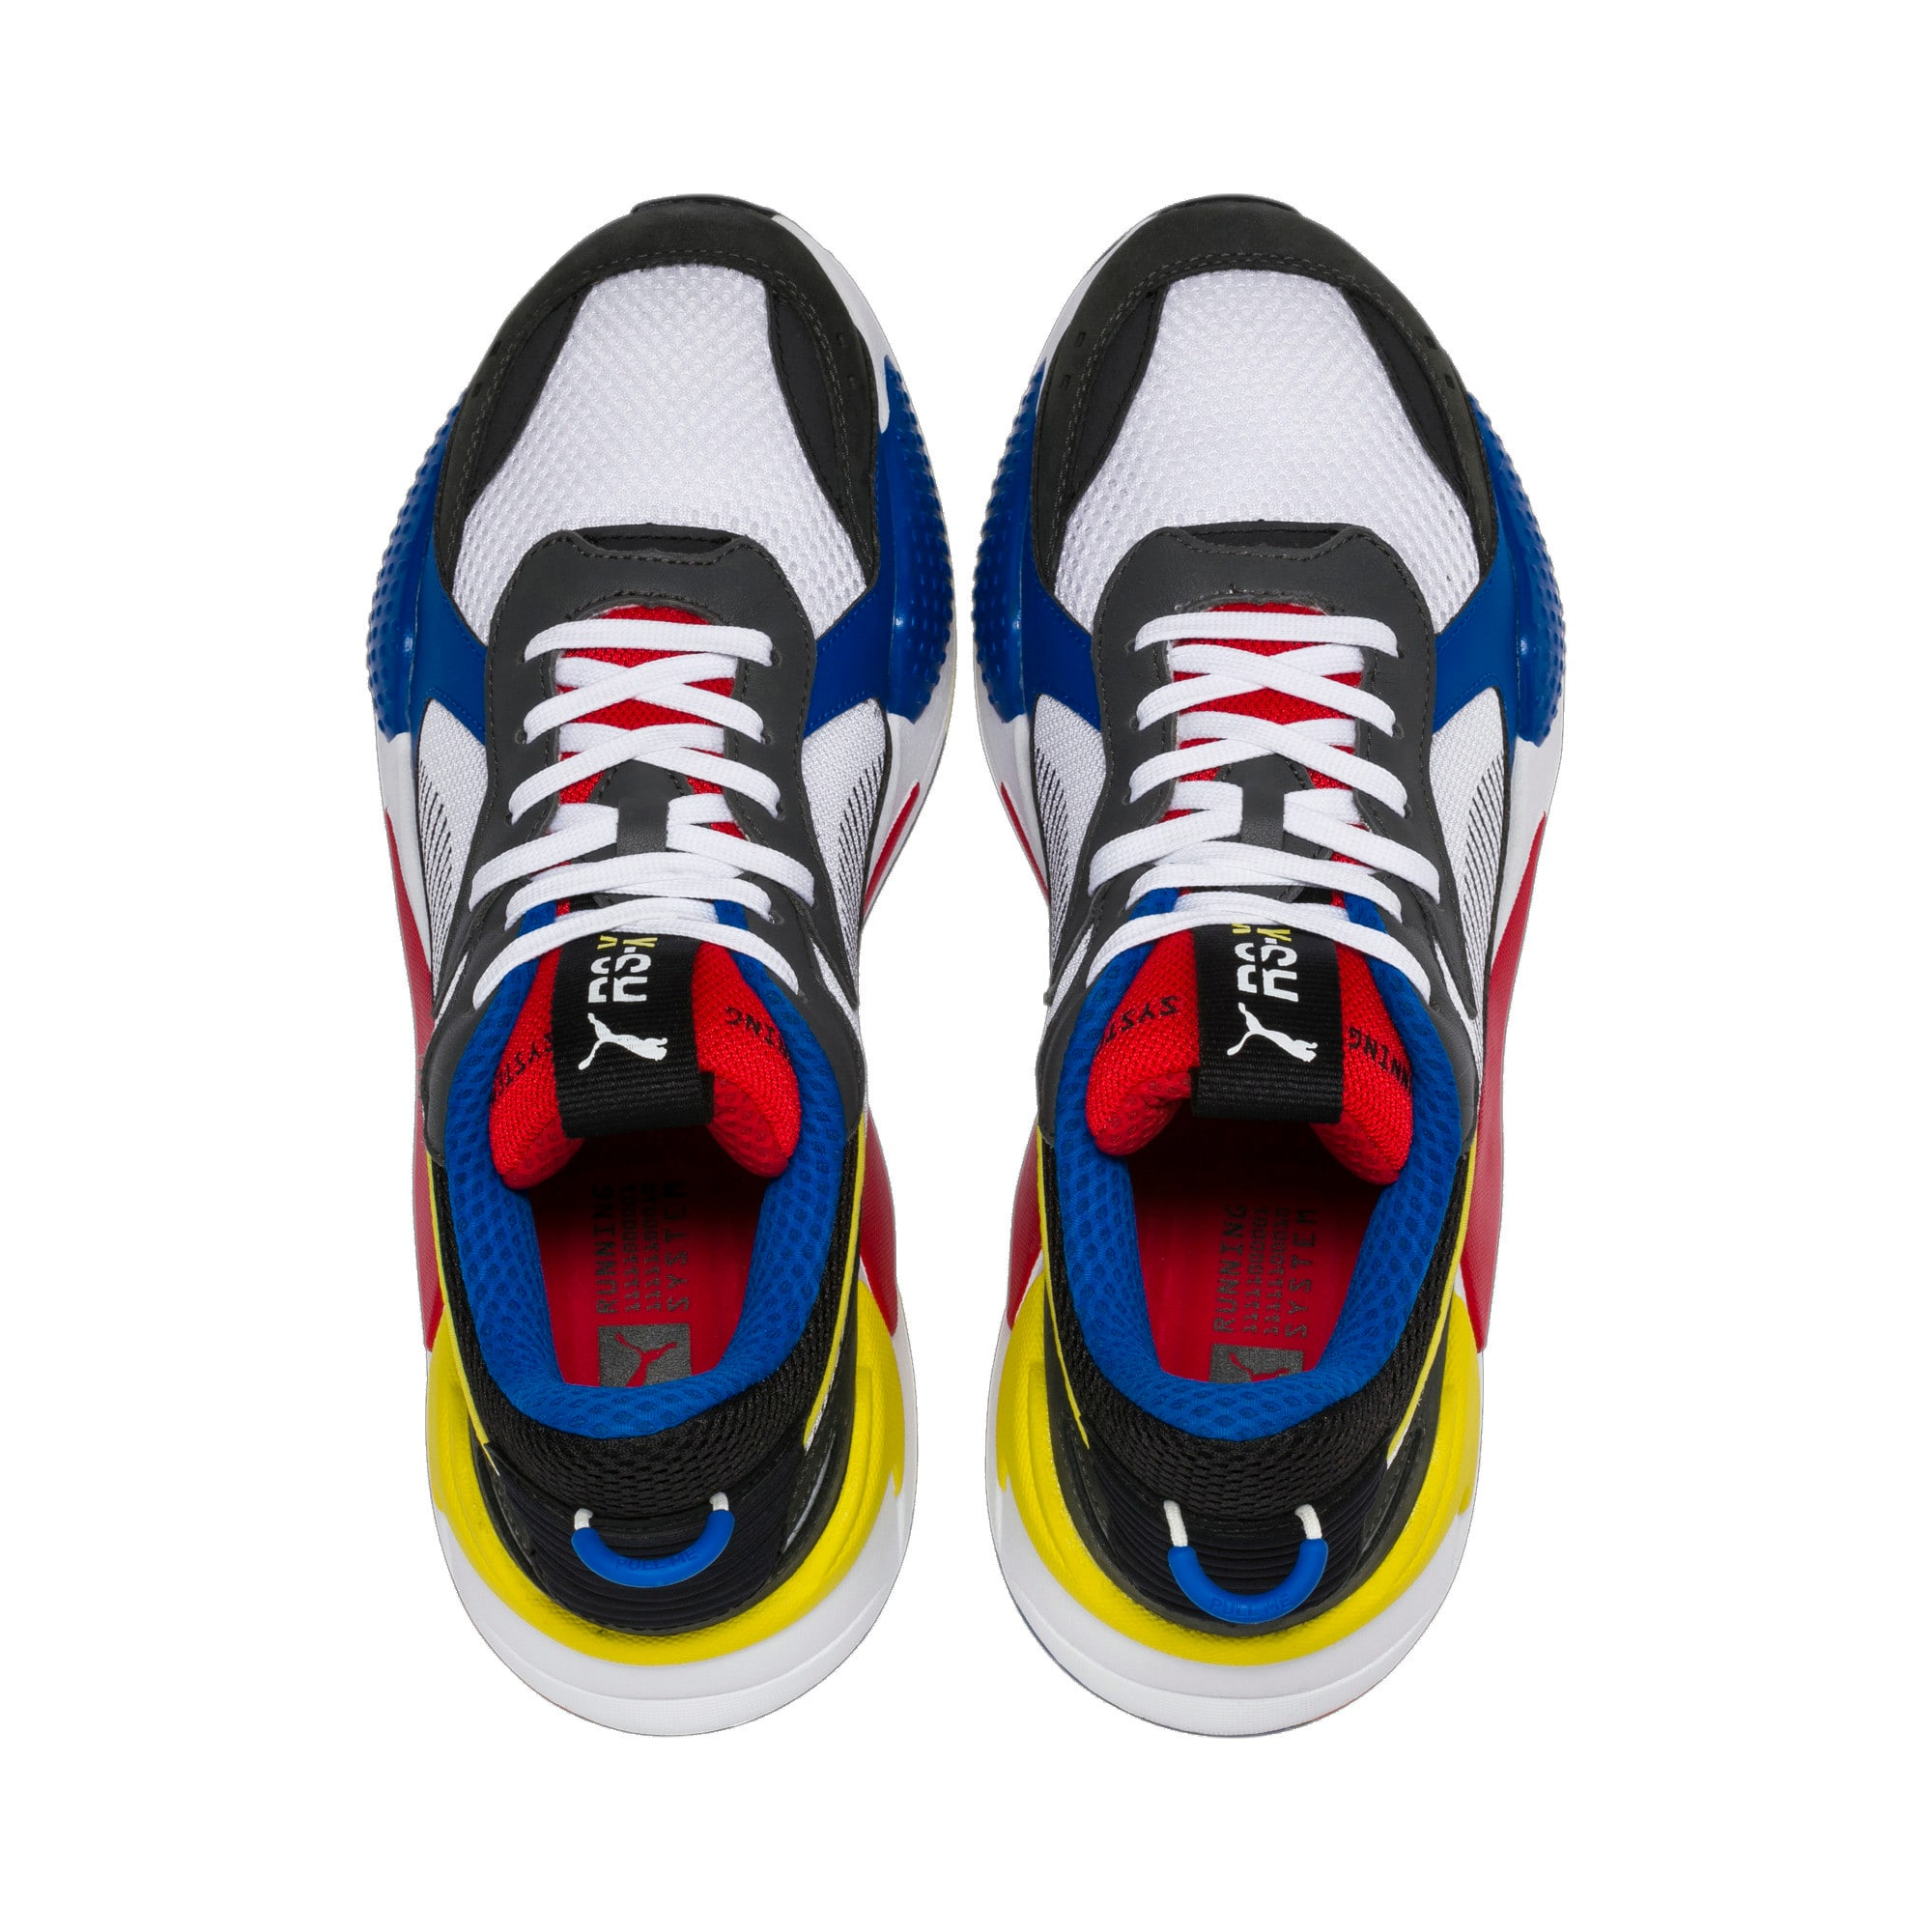 Thumbnail 8 of RS-X Toys Sneakers, Puma White-Puma Royal, medium